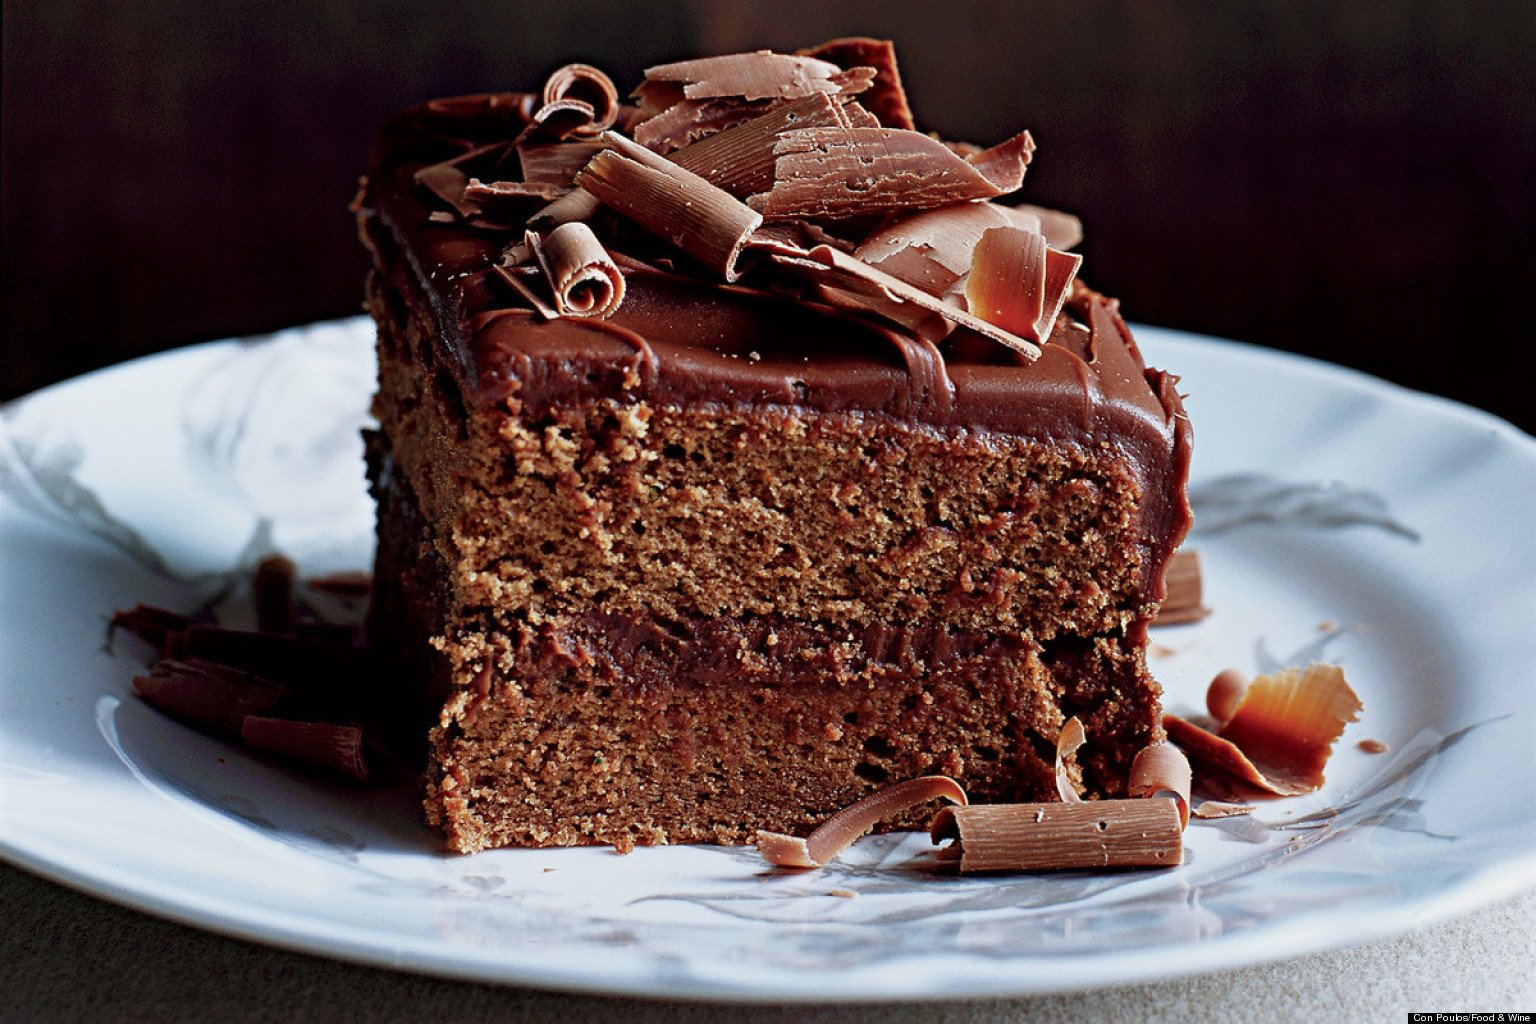 Best Cake Recipe  The Best Chocolate Cake Recipes You ll Ever Make PHOTOS